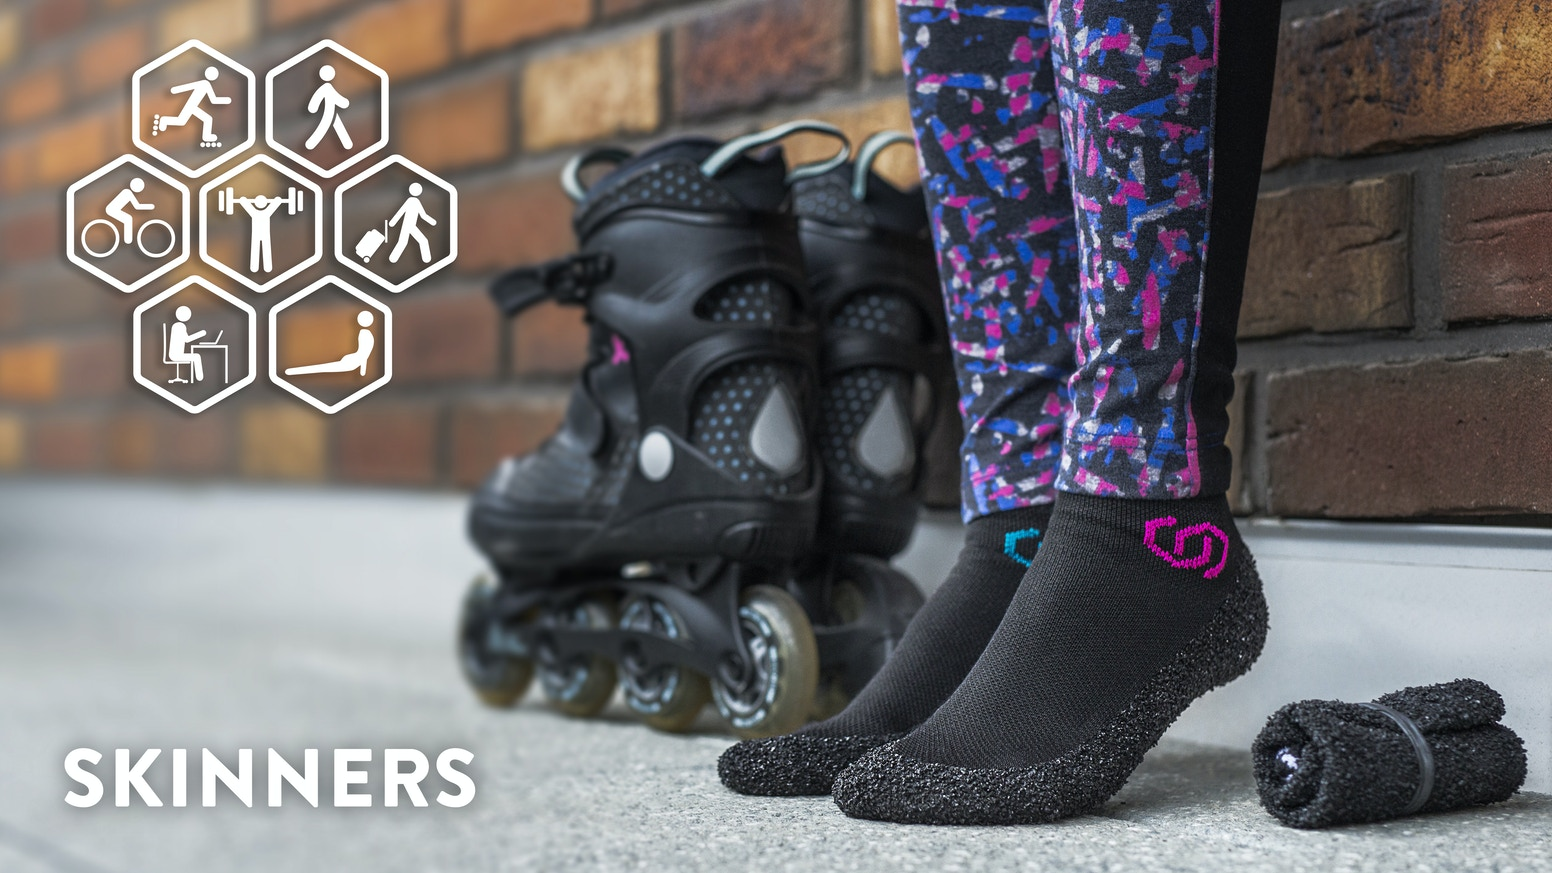 SKINNERS  Revolutionary Ultraportable Footwear with Silver by Skinners  Technologies — Kickstarter ce2f00ebfa